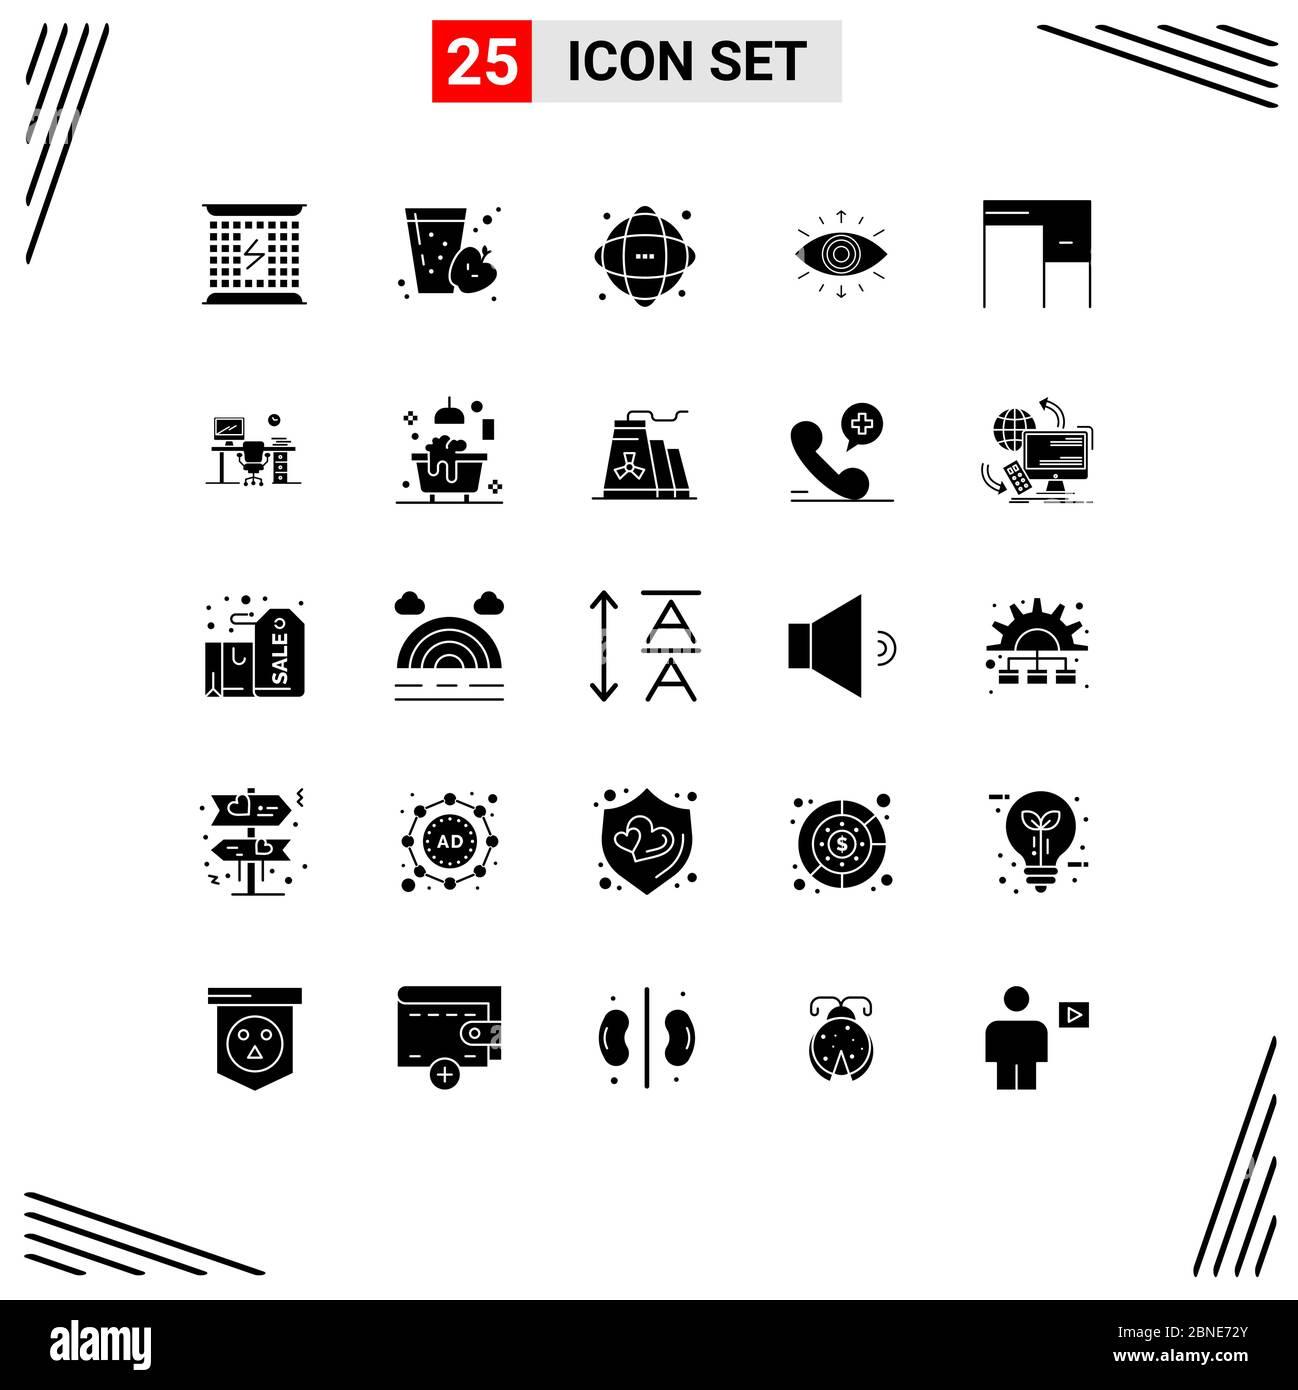 Pack Of 25 Creative Solid Glyphs Of Member Symbol Apple Eye Network Editable Vector Design Elements Stock Vector Image Art Alamy